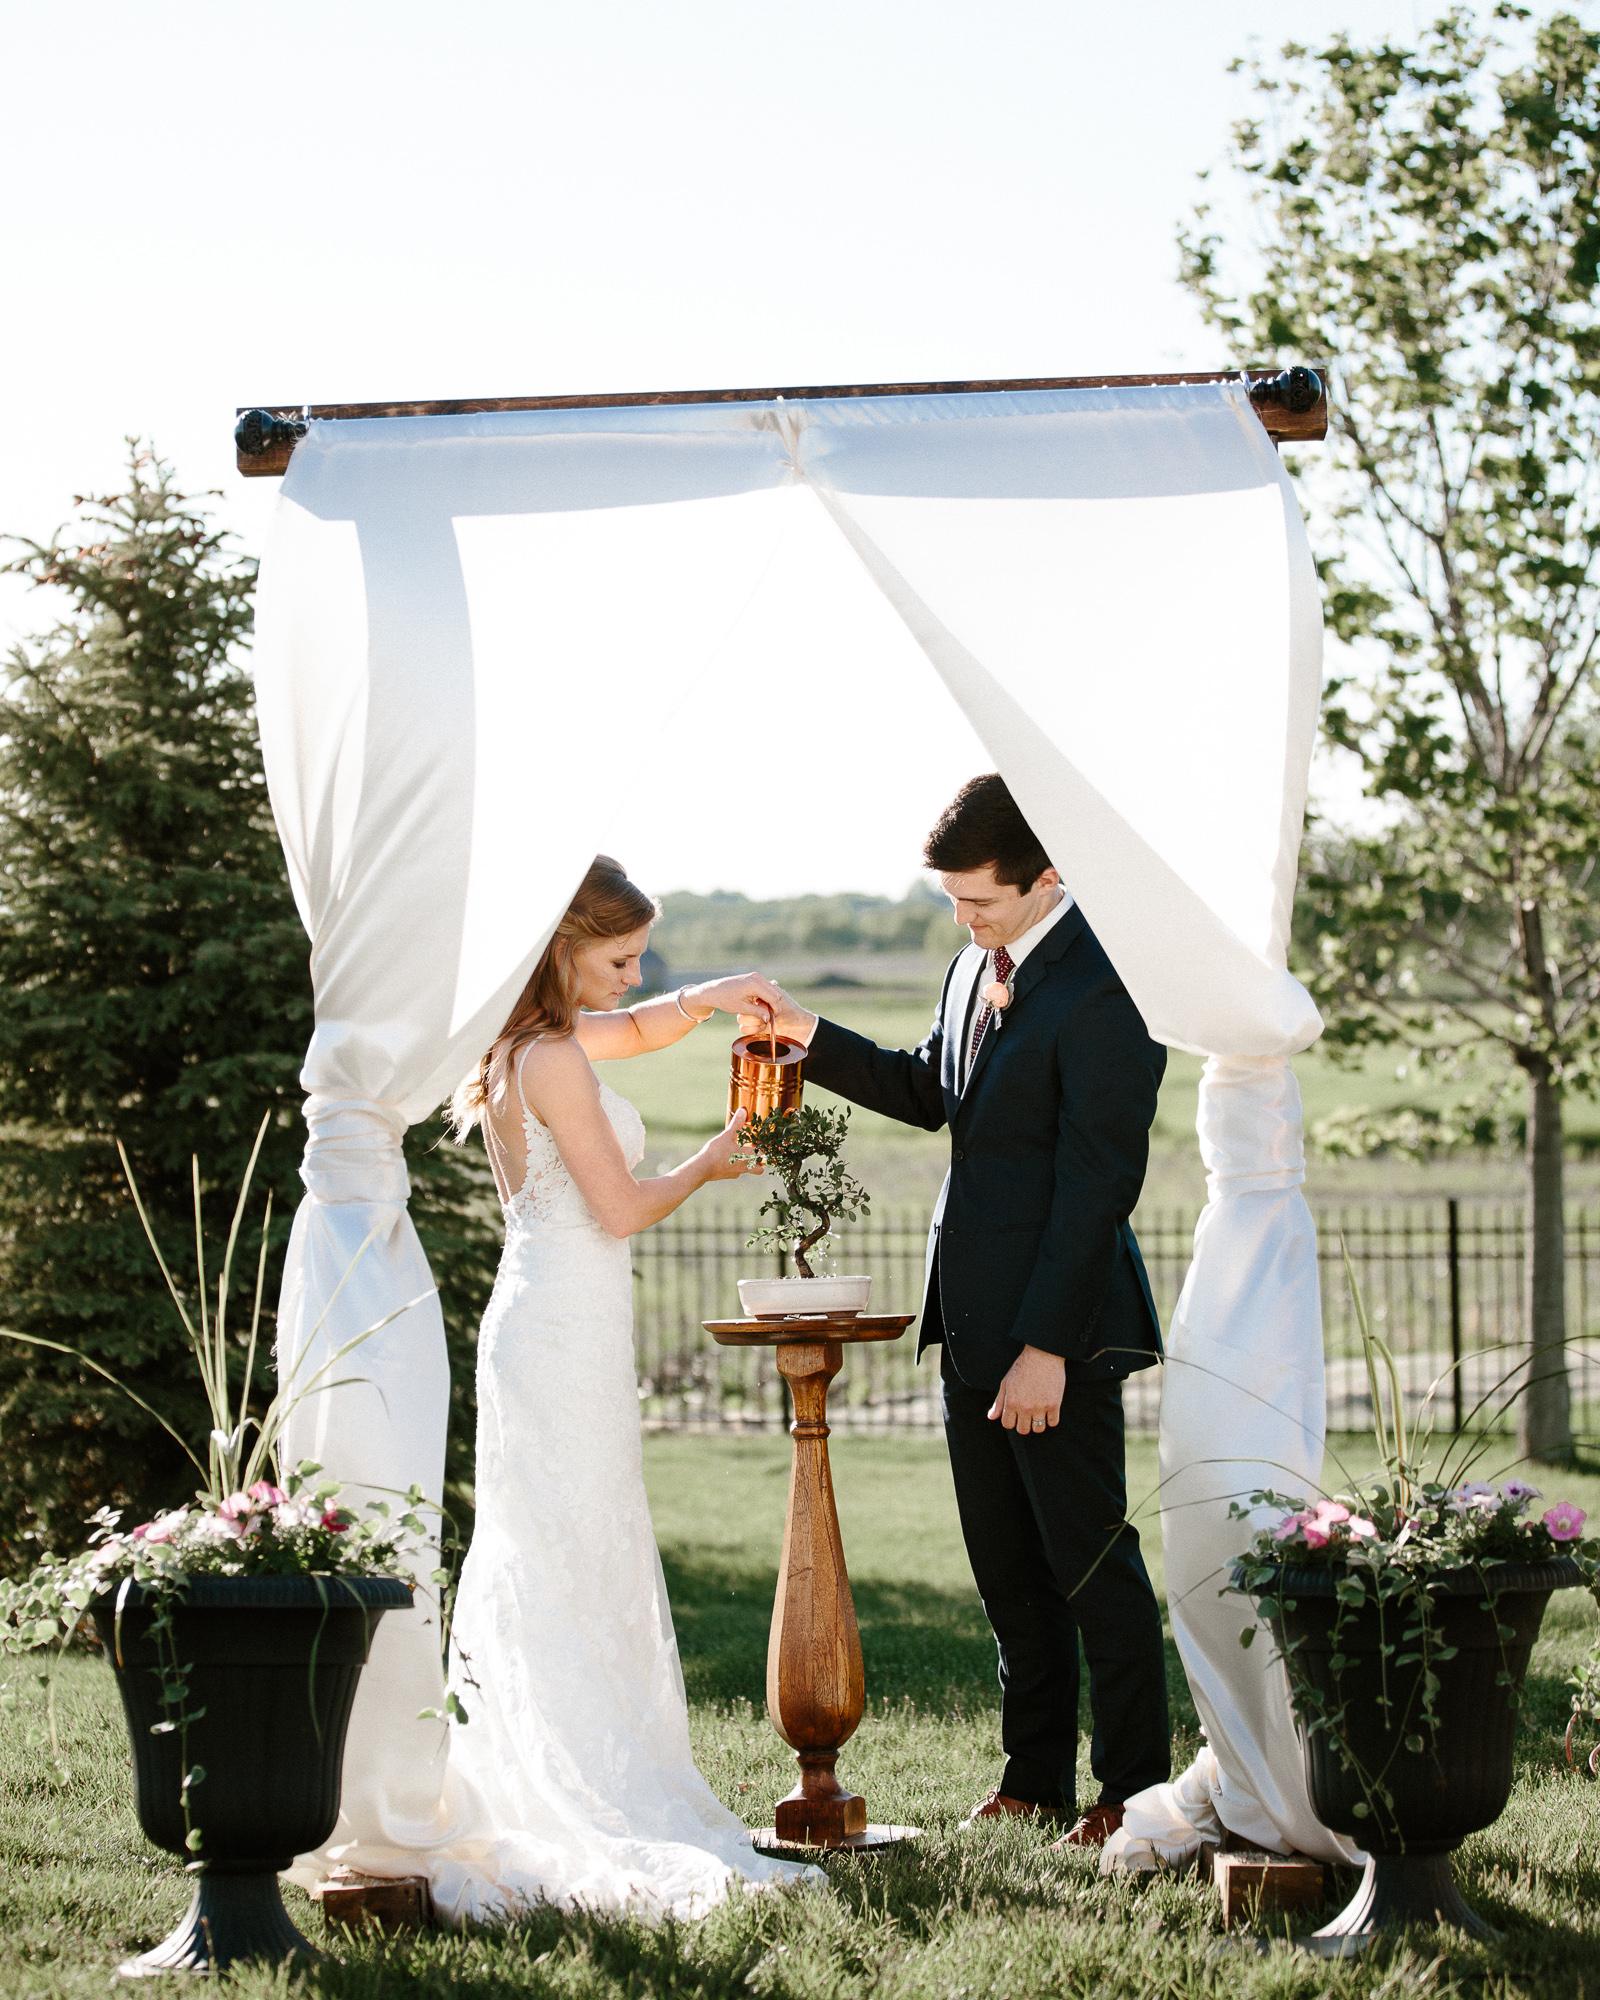 wedding-elopement-adventerous-romantic-timeless-south-dakota-blue-haven-barn-049.jpg